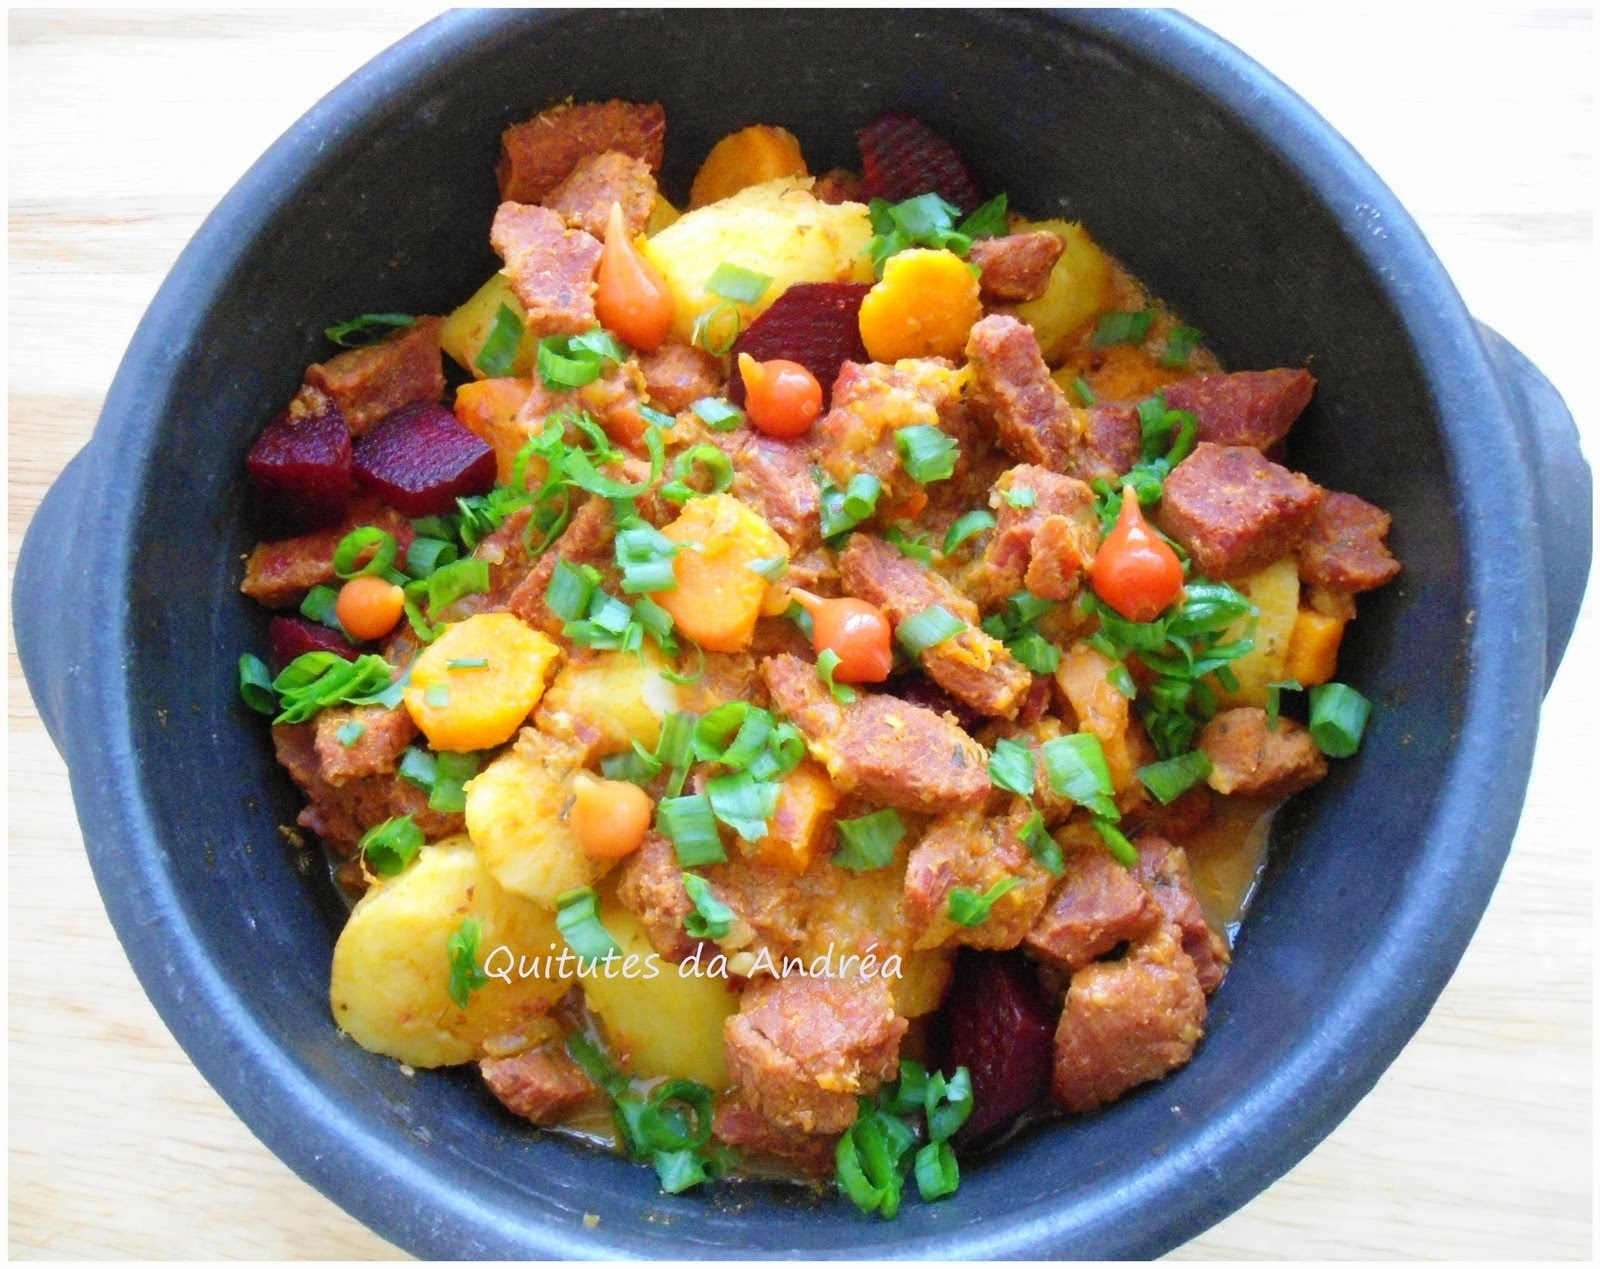 salada com batata cenoura chuchu e brocolis